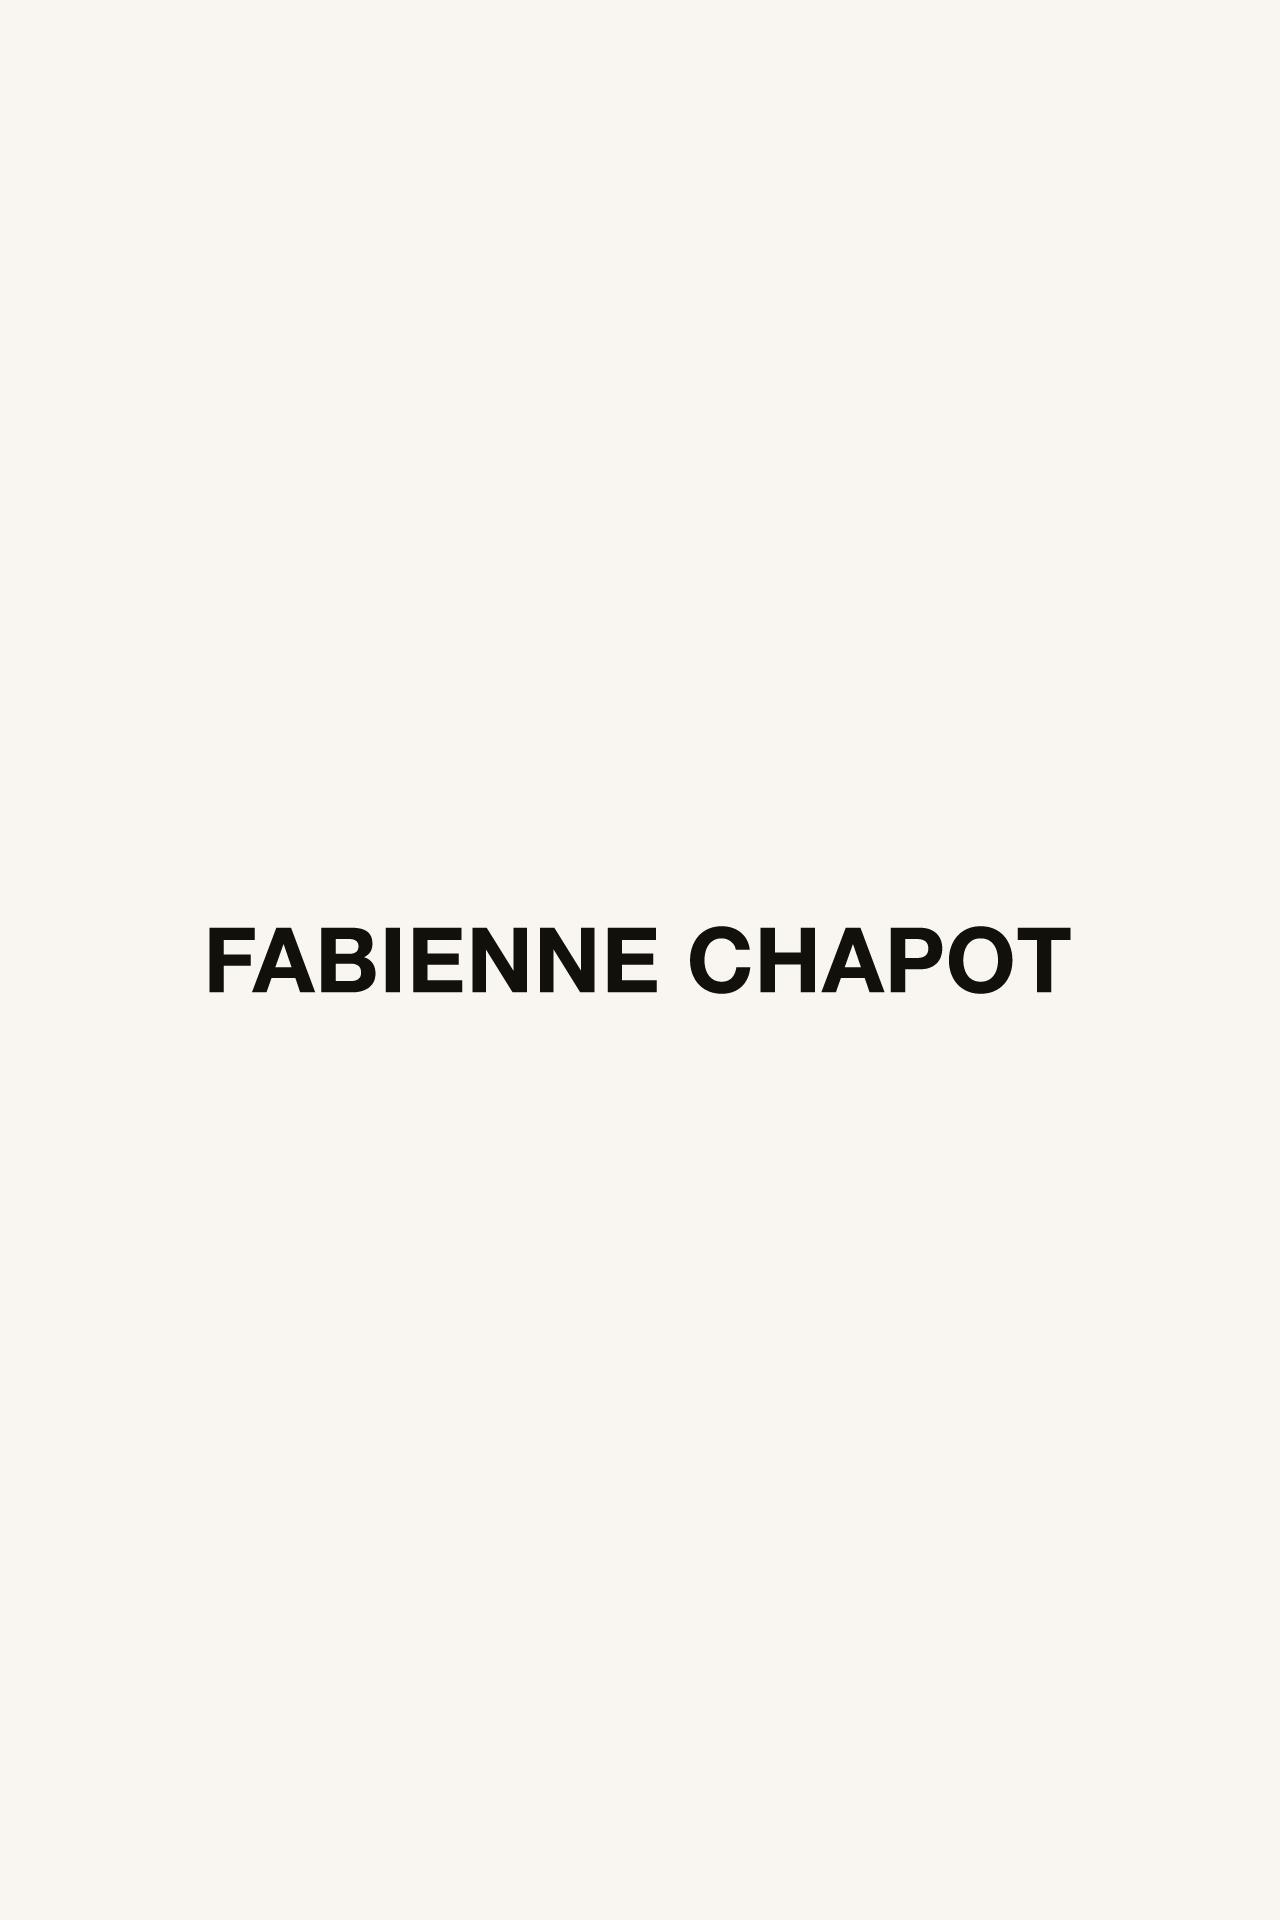 Sophie Bag Gratis Frakt Footlocker Bilder Offisielle Online Betale Med Paypal Online ZWv2ApHV